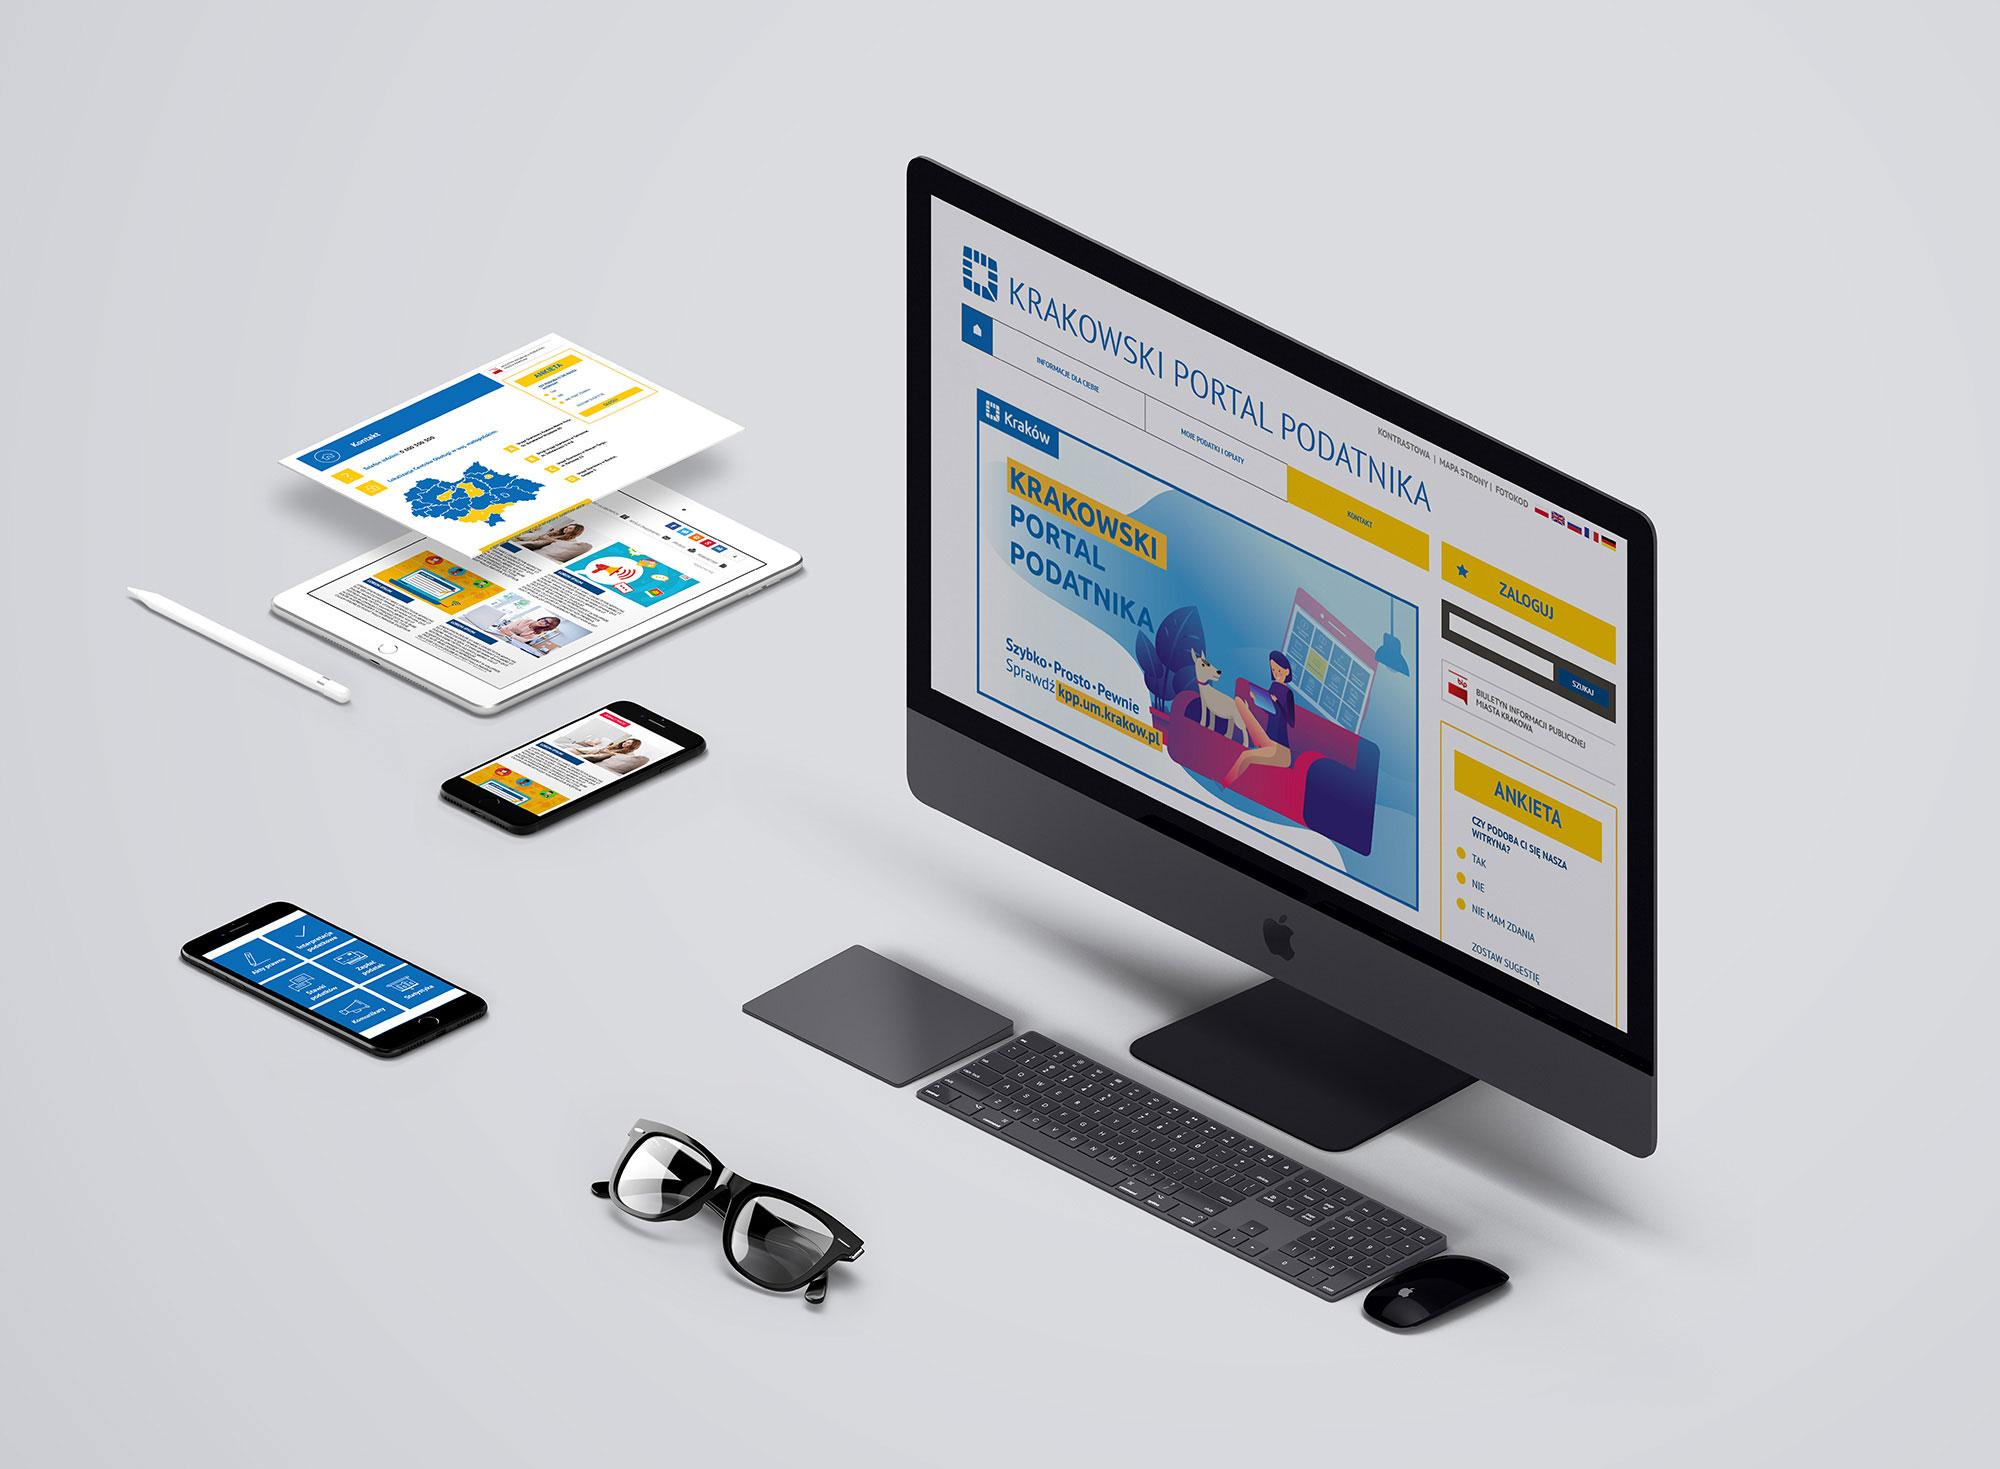 Krakowski Portal Podatnika